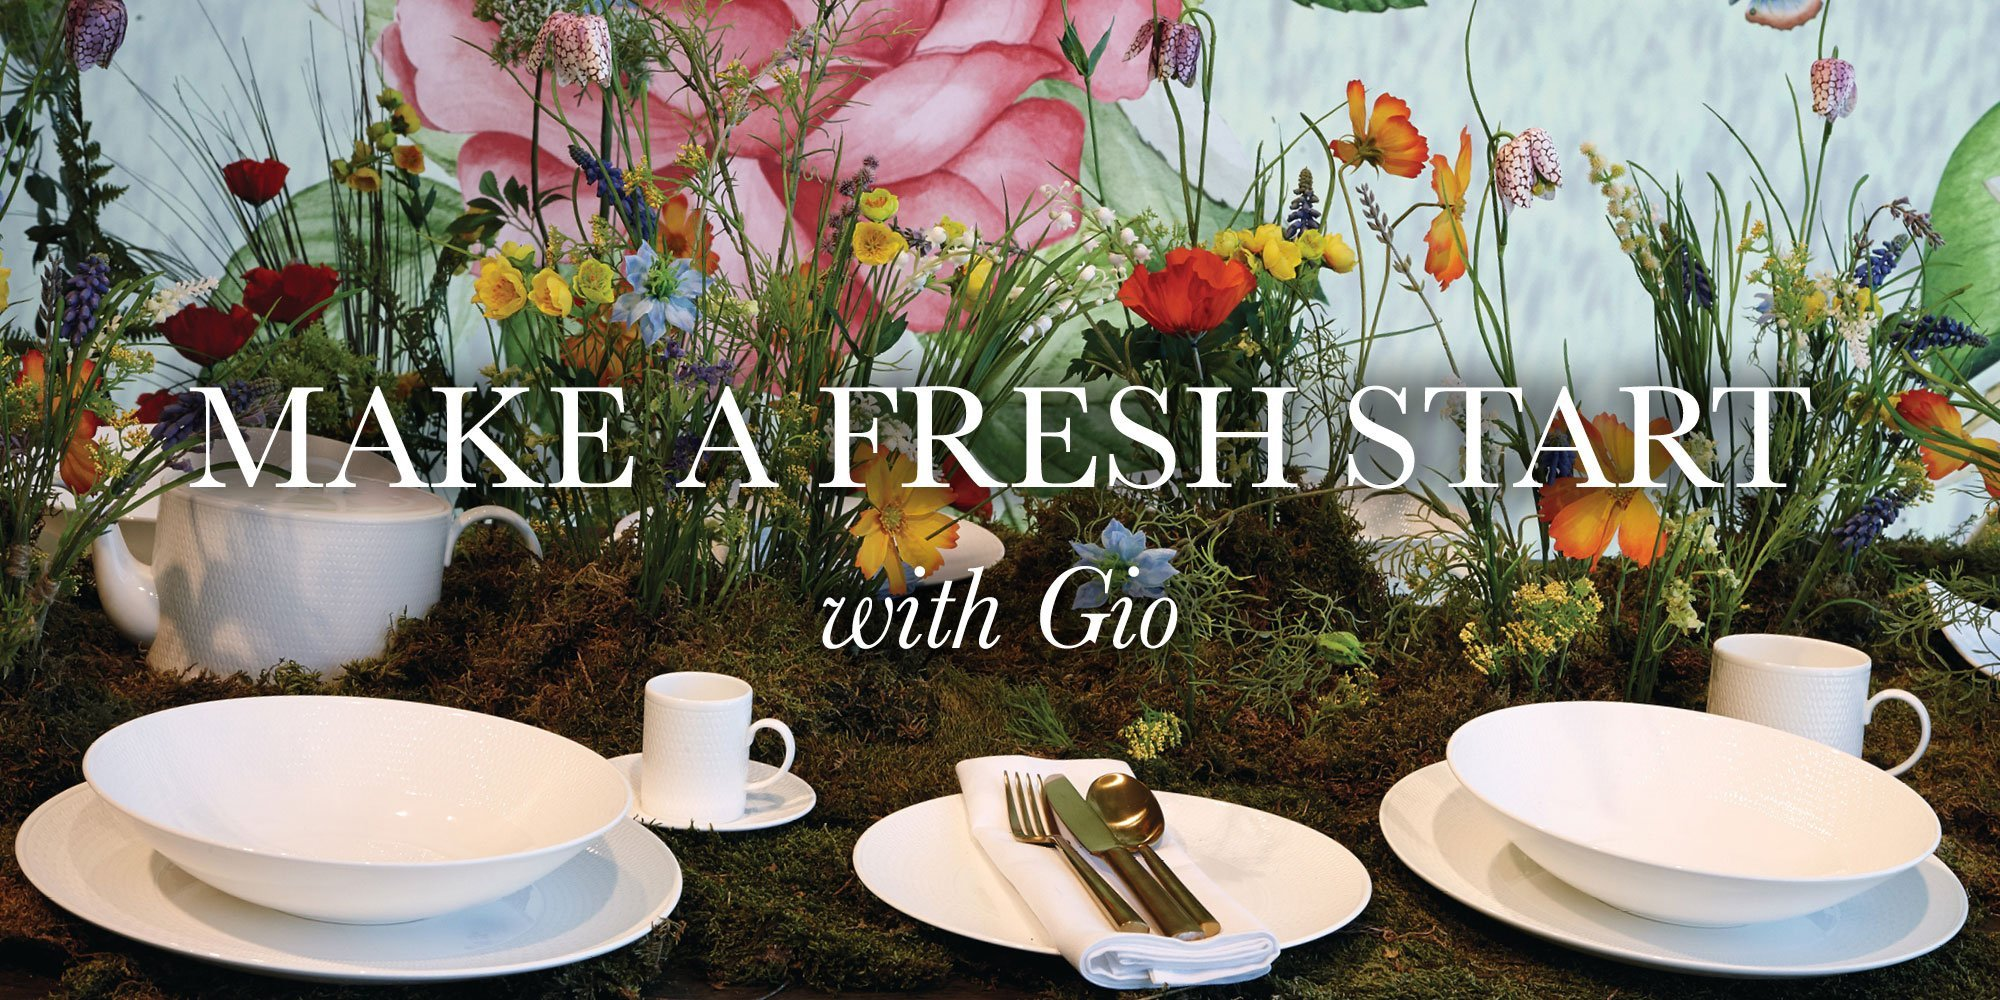 Wedgwood Gio Tableware